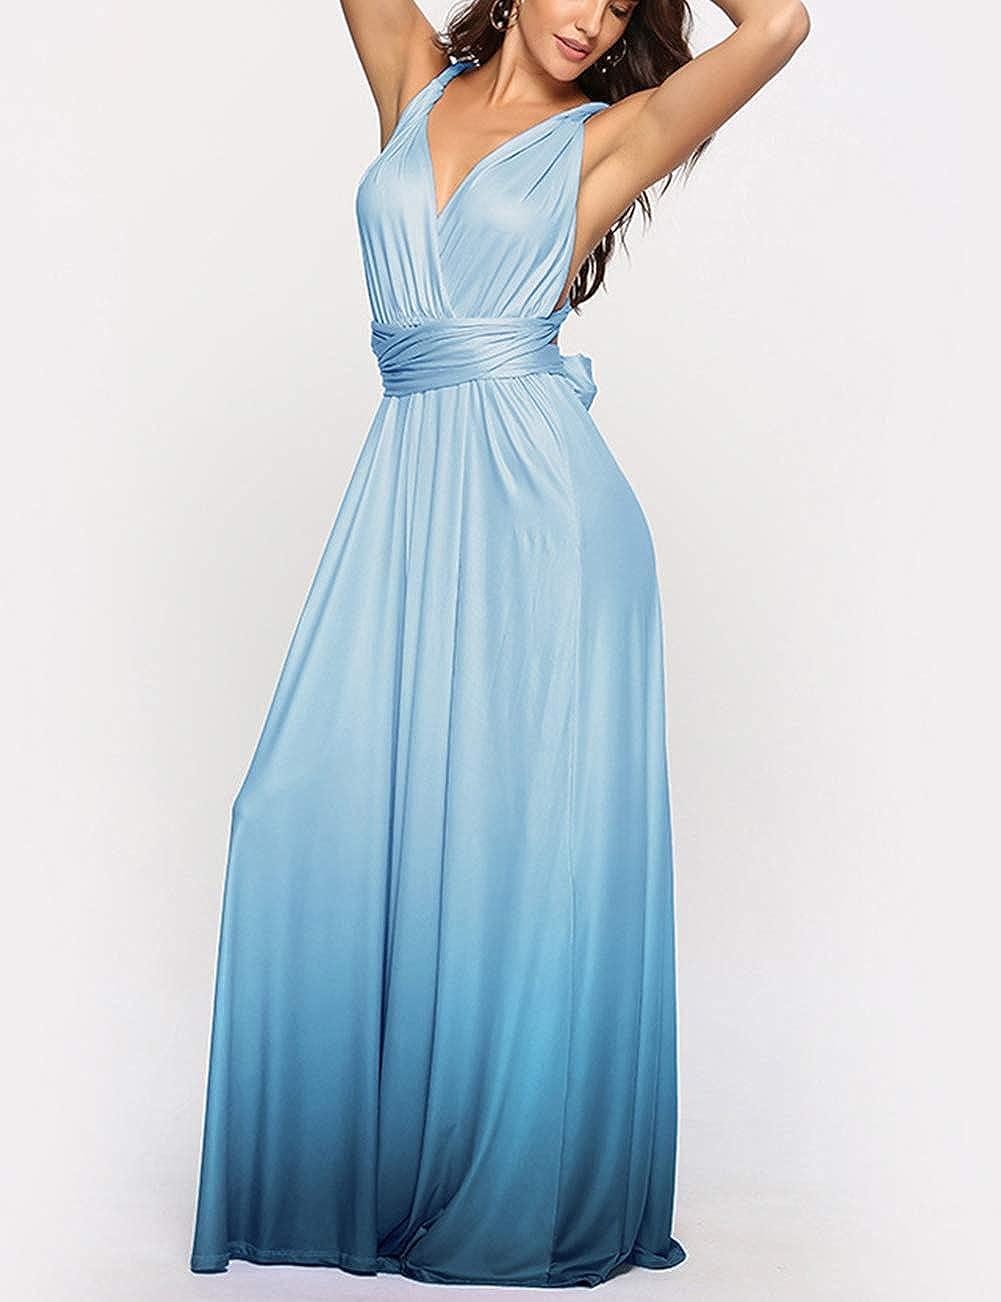 FeelinGirl Dress Gonna Donna con Cinturini Cinturino variet/à Indietro Spalla Nuda Sera Elegante S-XL